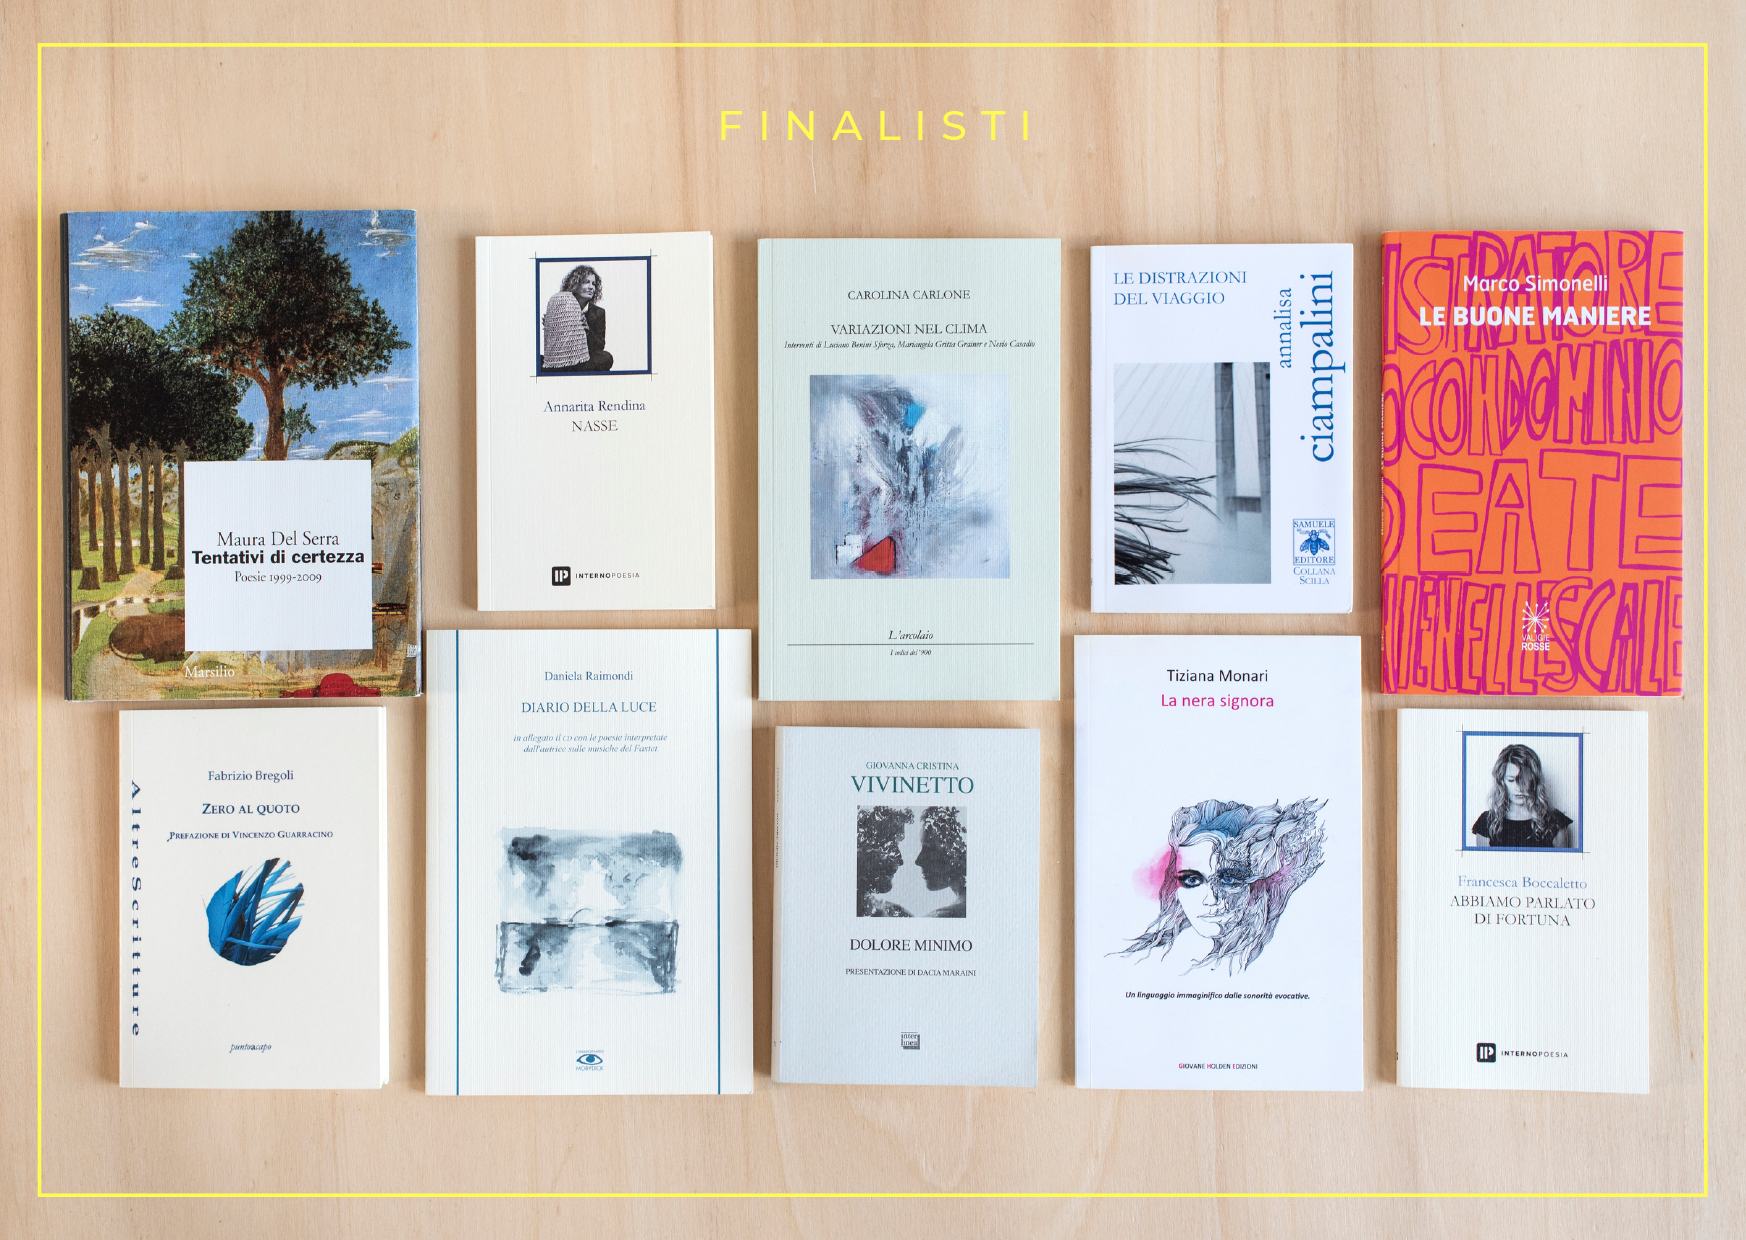 Premio Prato Poesia 2_finalisti.jpg